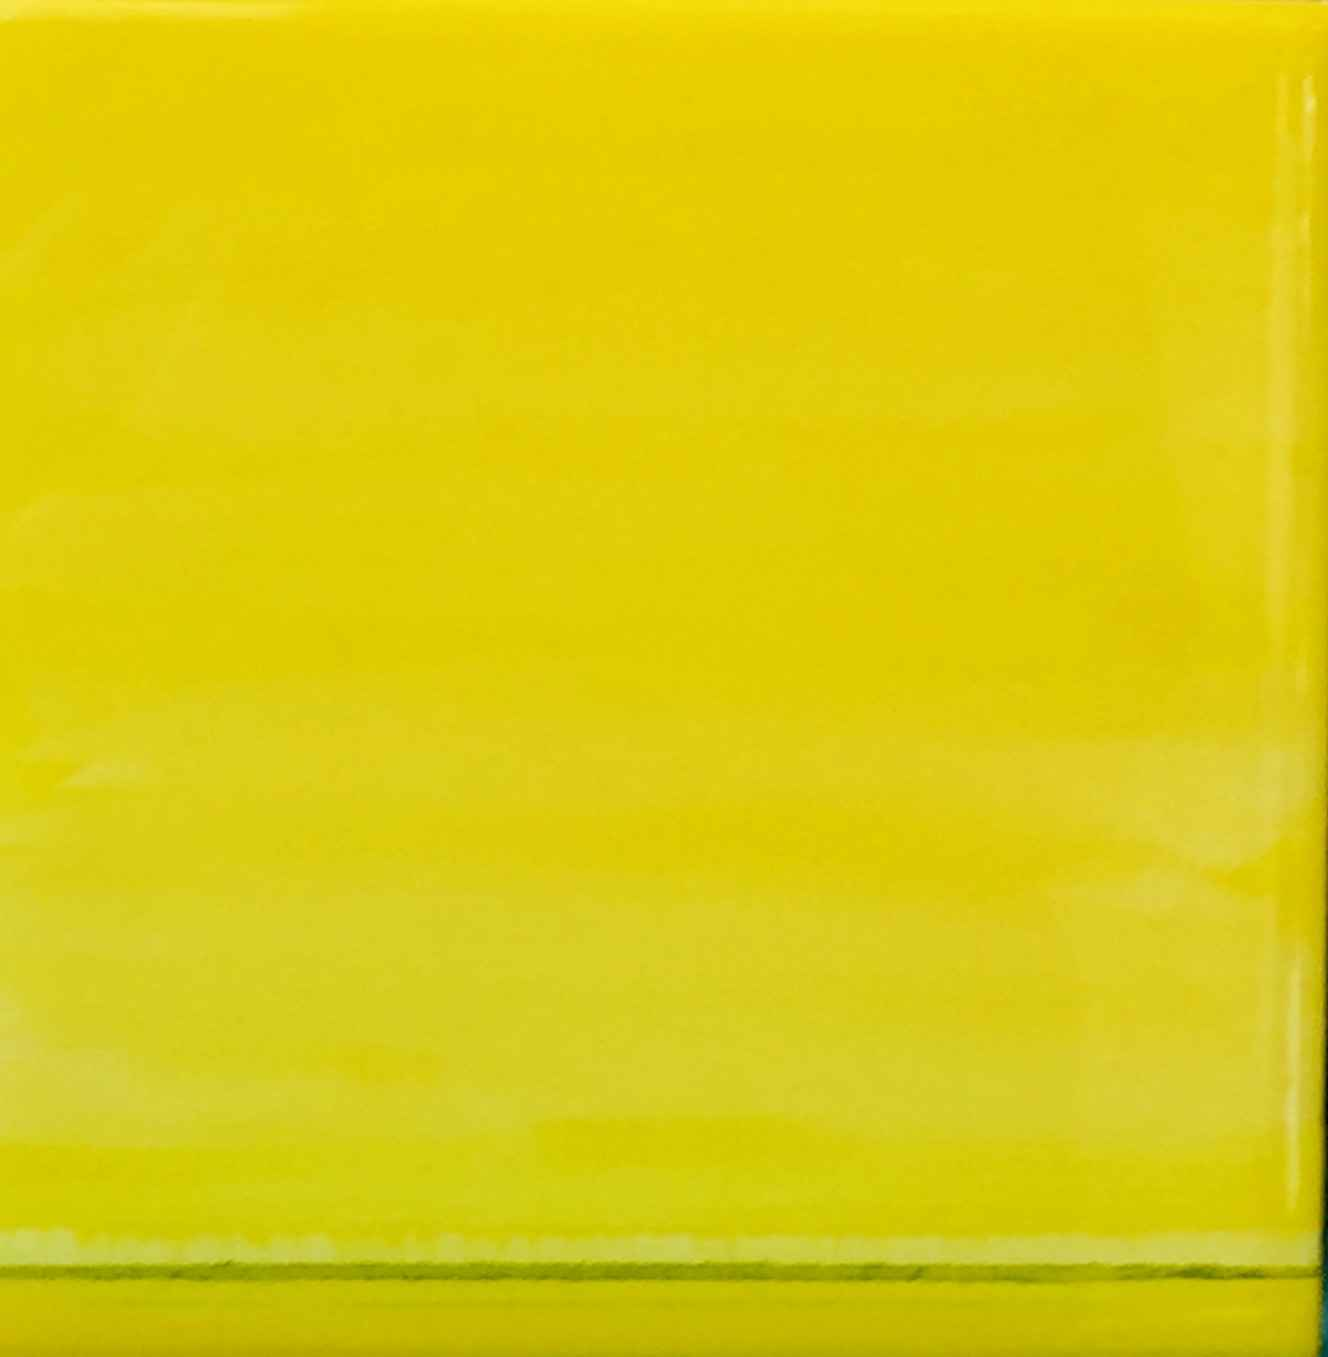 Z Marigold Yellow Sky by  Jane Fleetwood-Morrow - Masterpiece Online